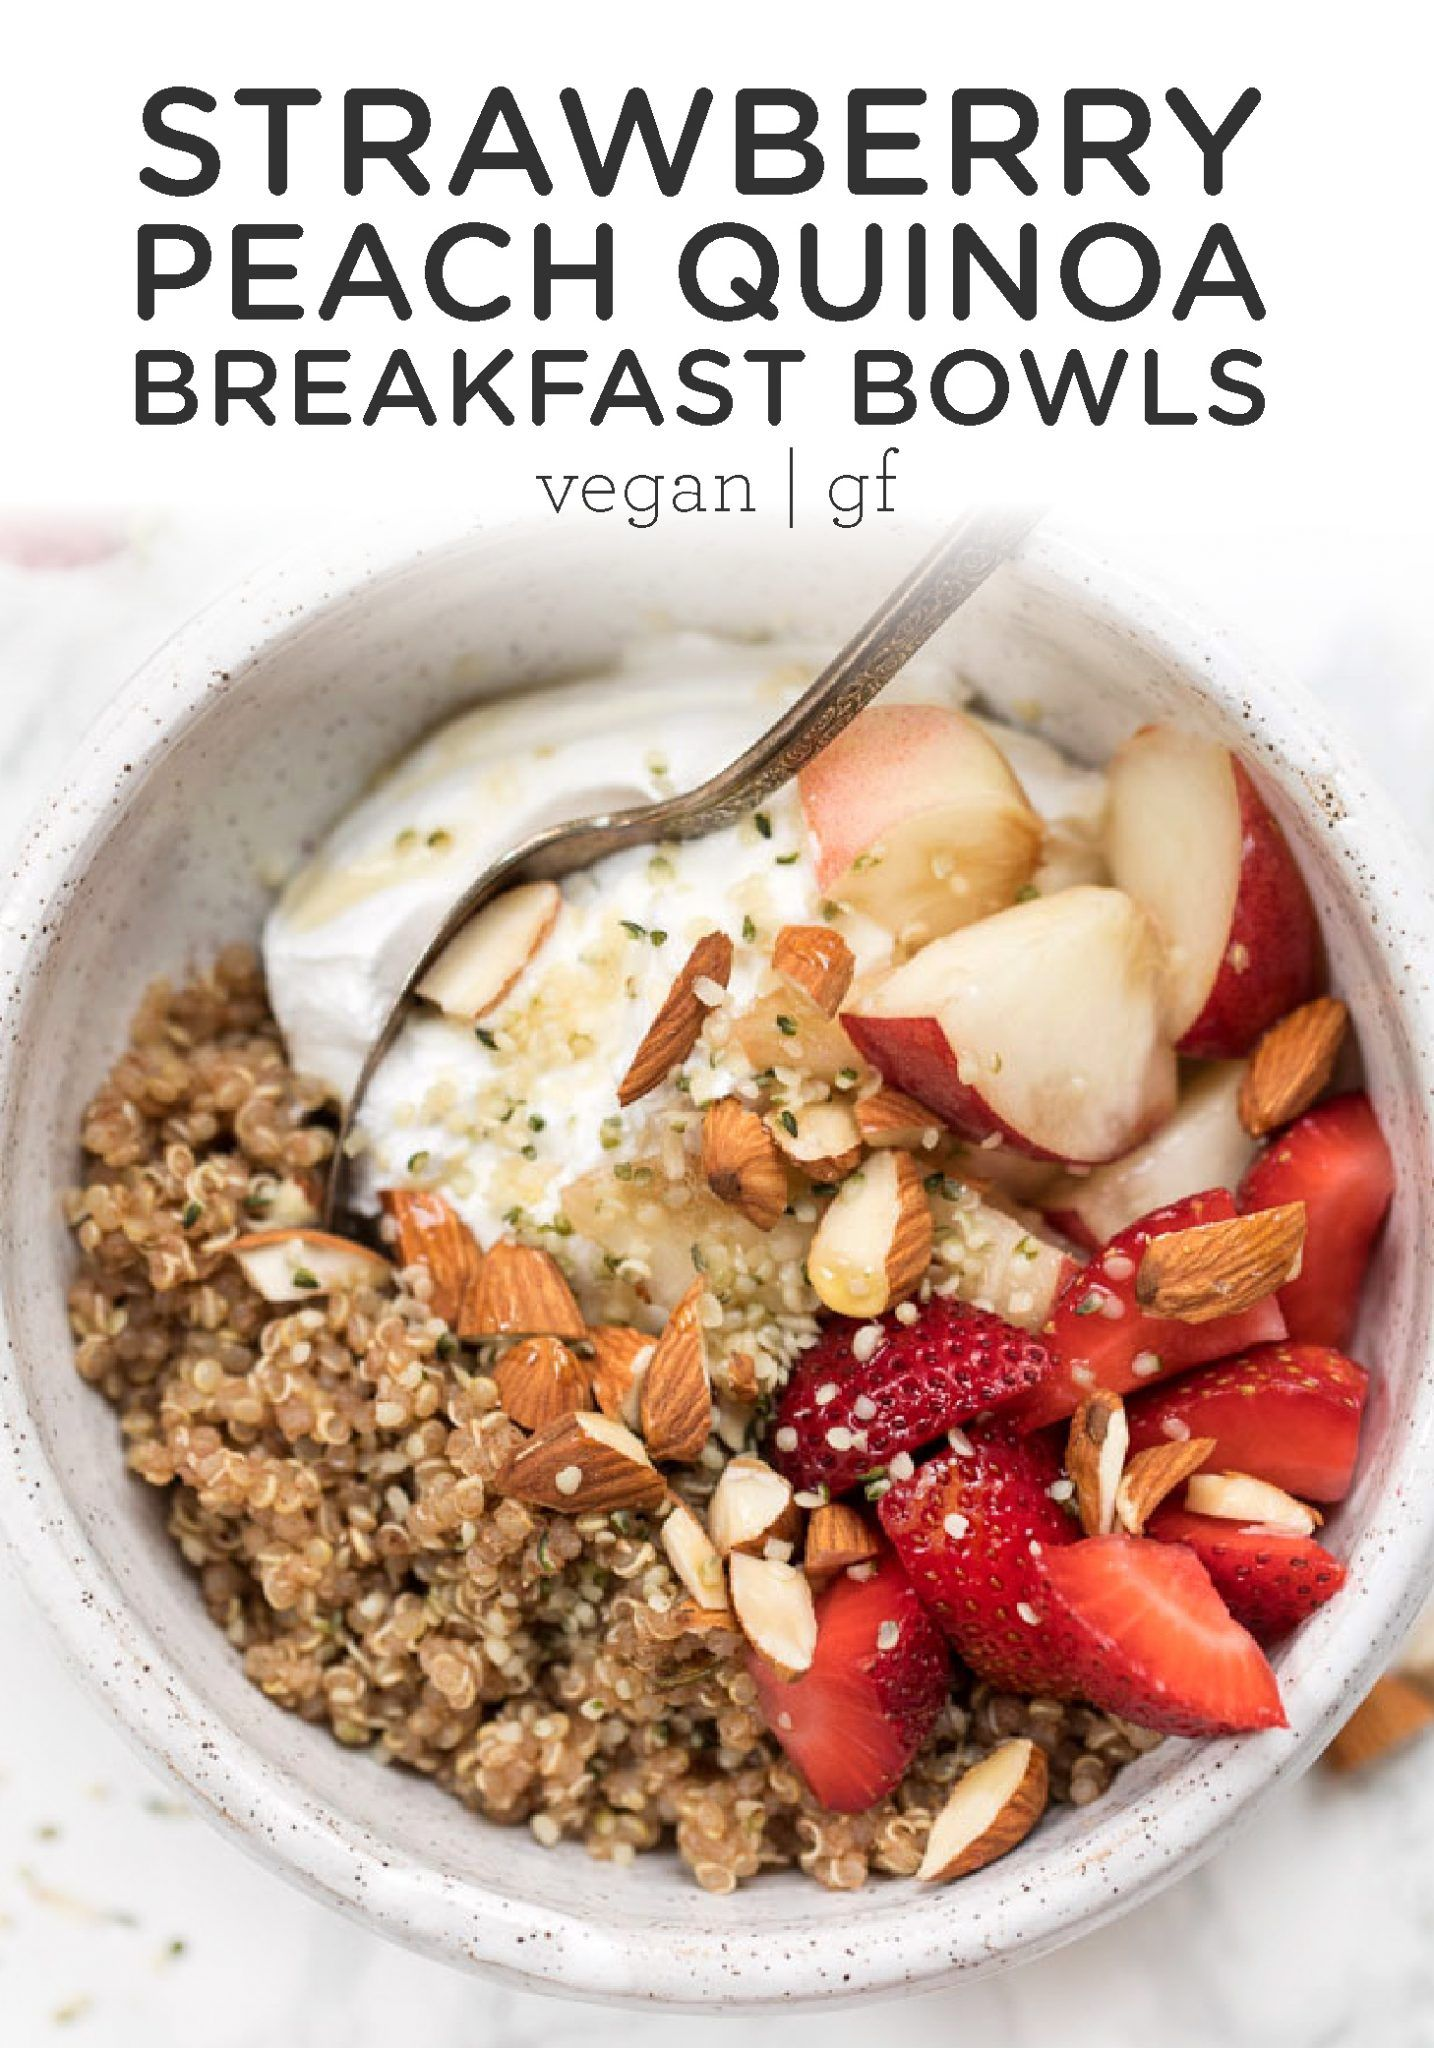 Strawberry Peach Quinoa Breakfast Bowls Simply Quinoa Recipe Breakfast Bowls Yogurt Breakfast Bowl Quinoa Breakfast Bowl